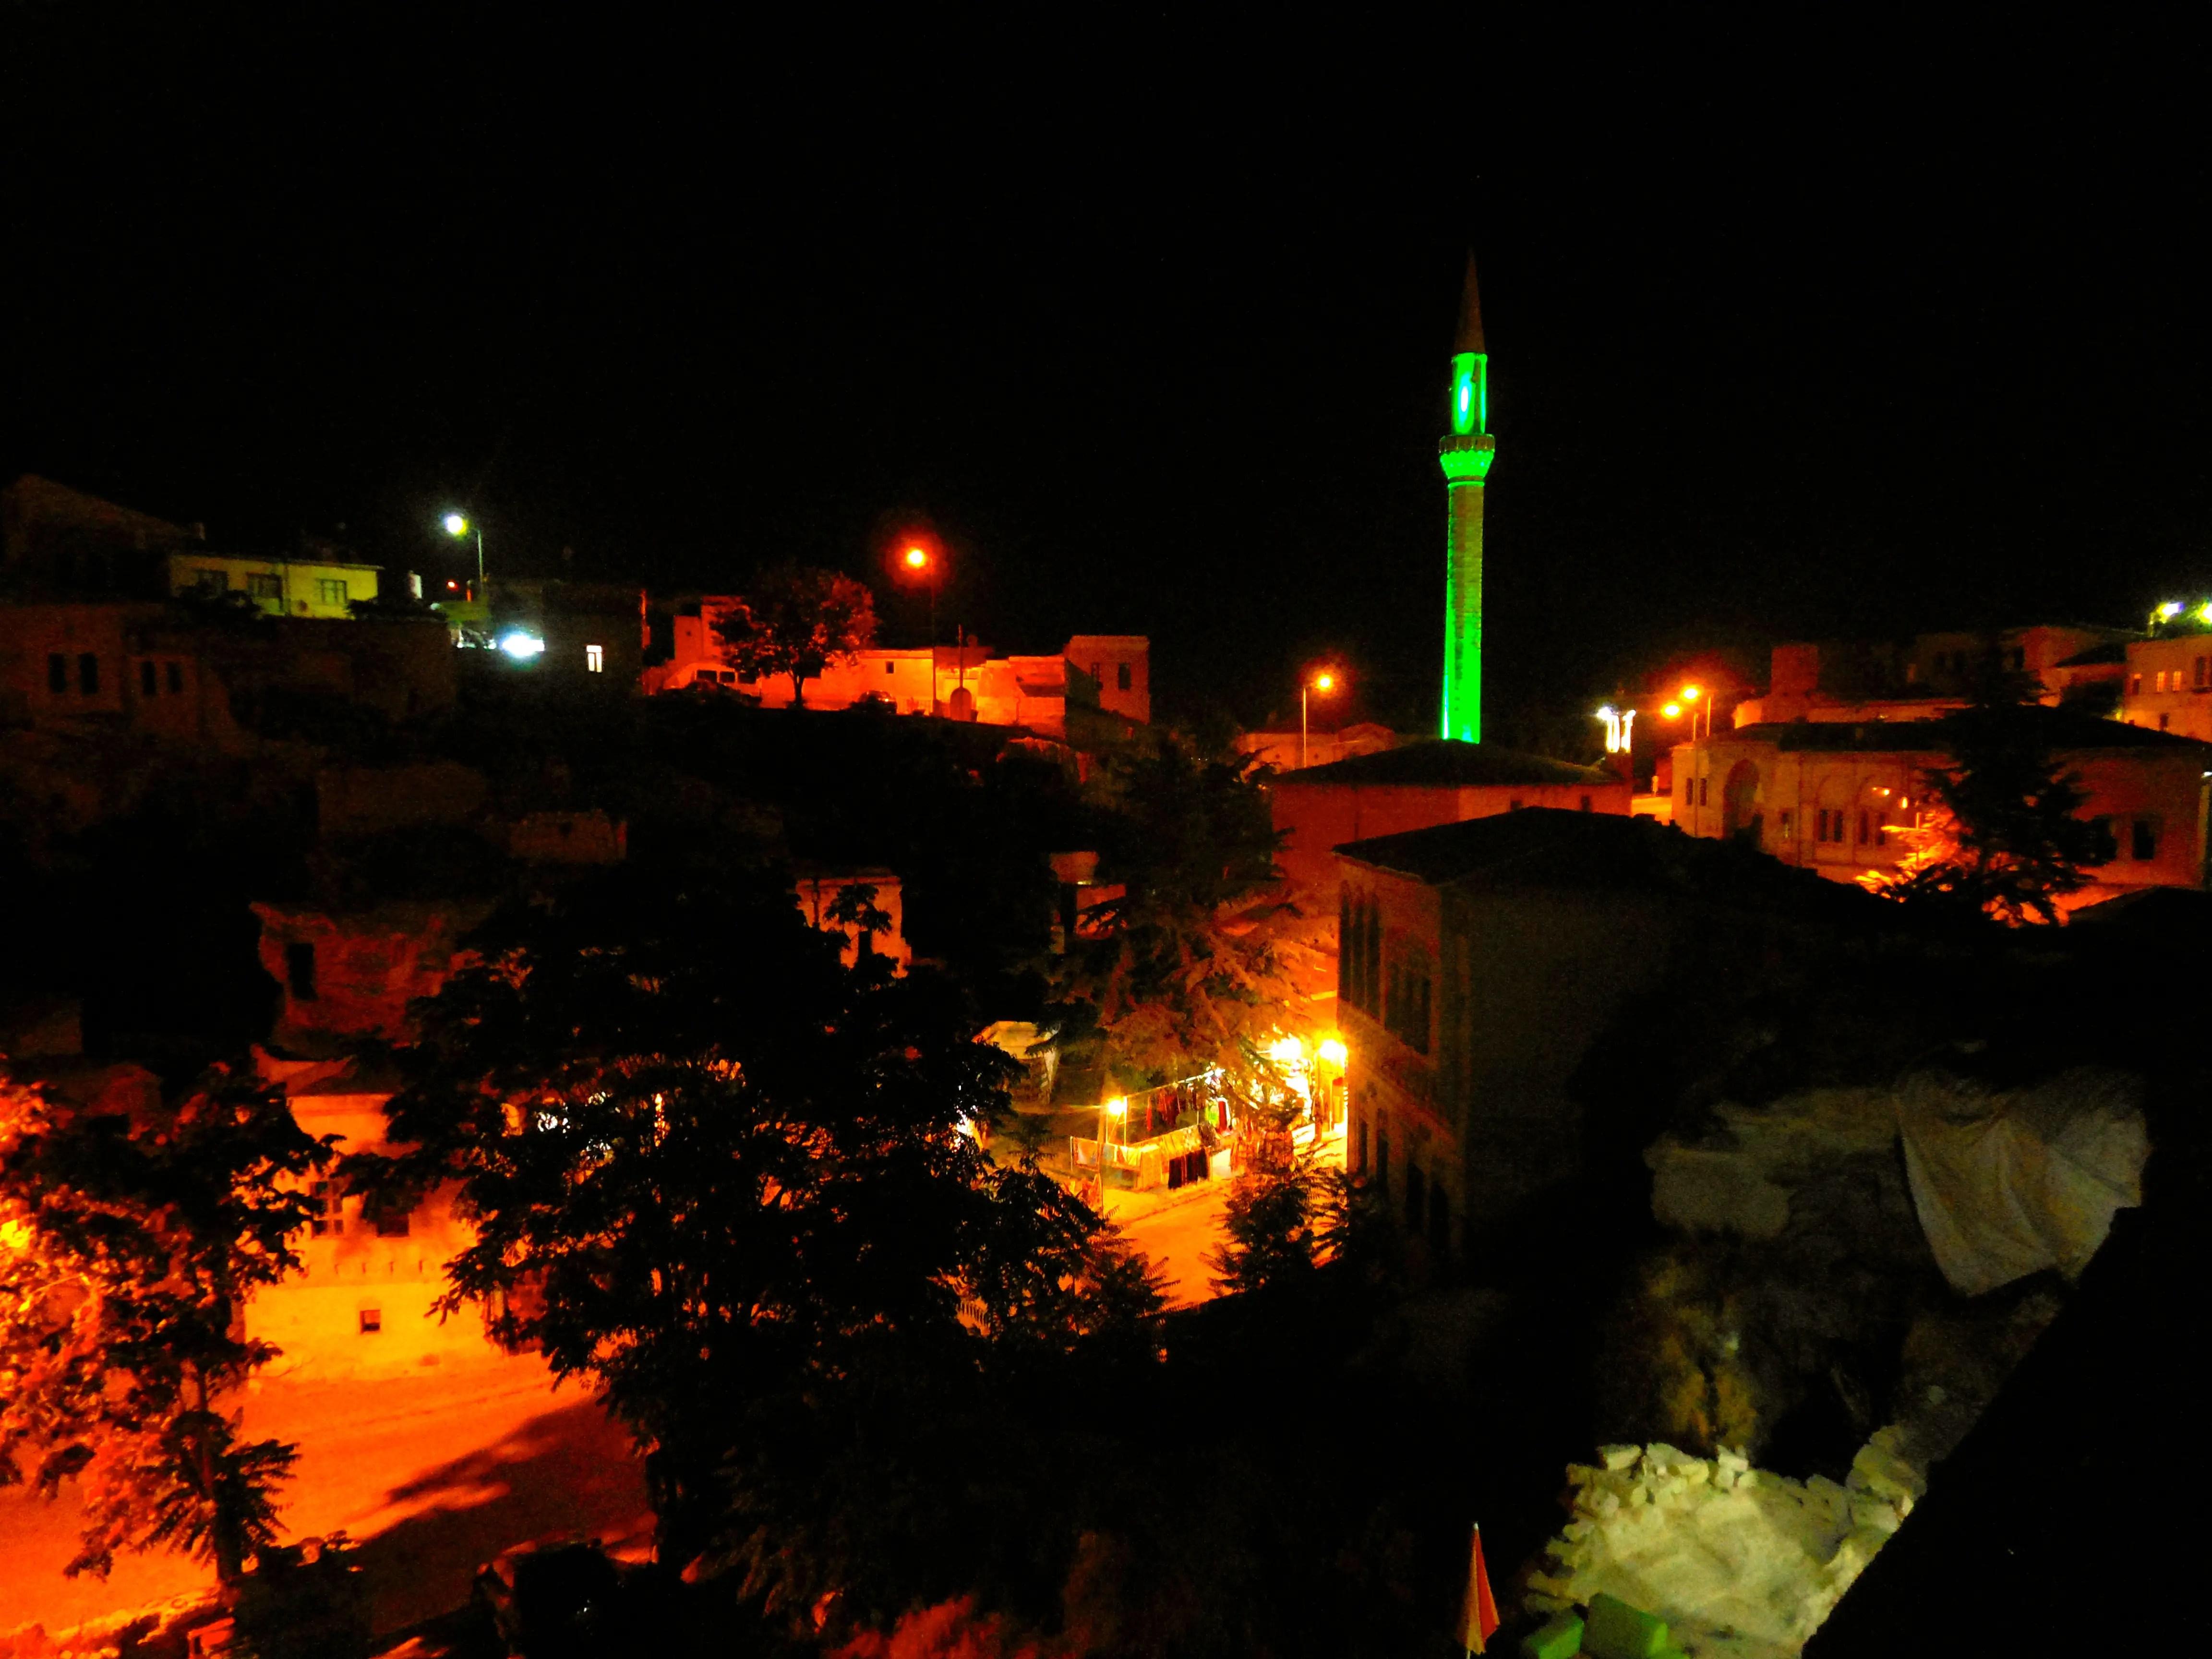 Mustafapasa at night